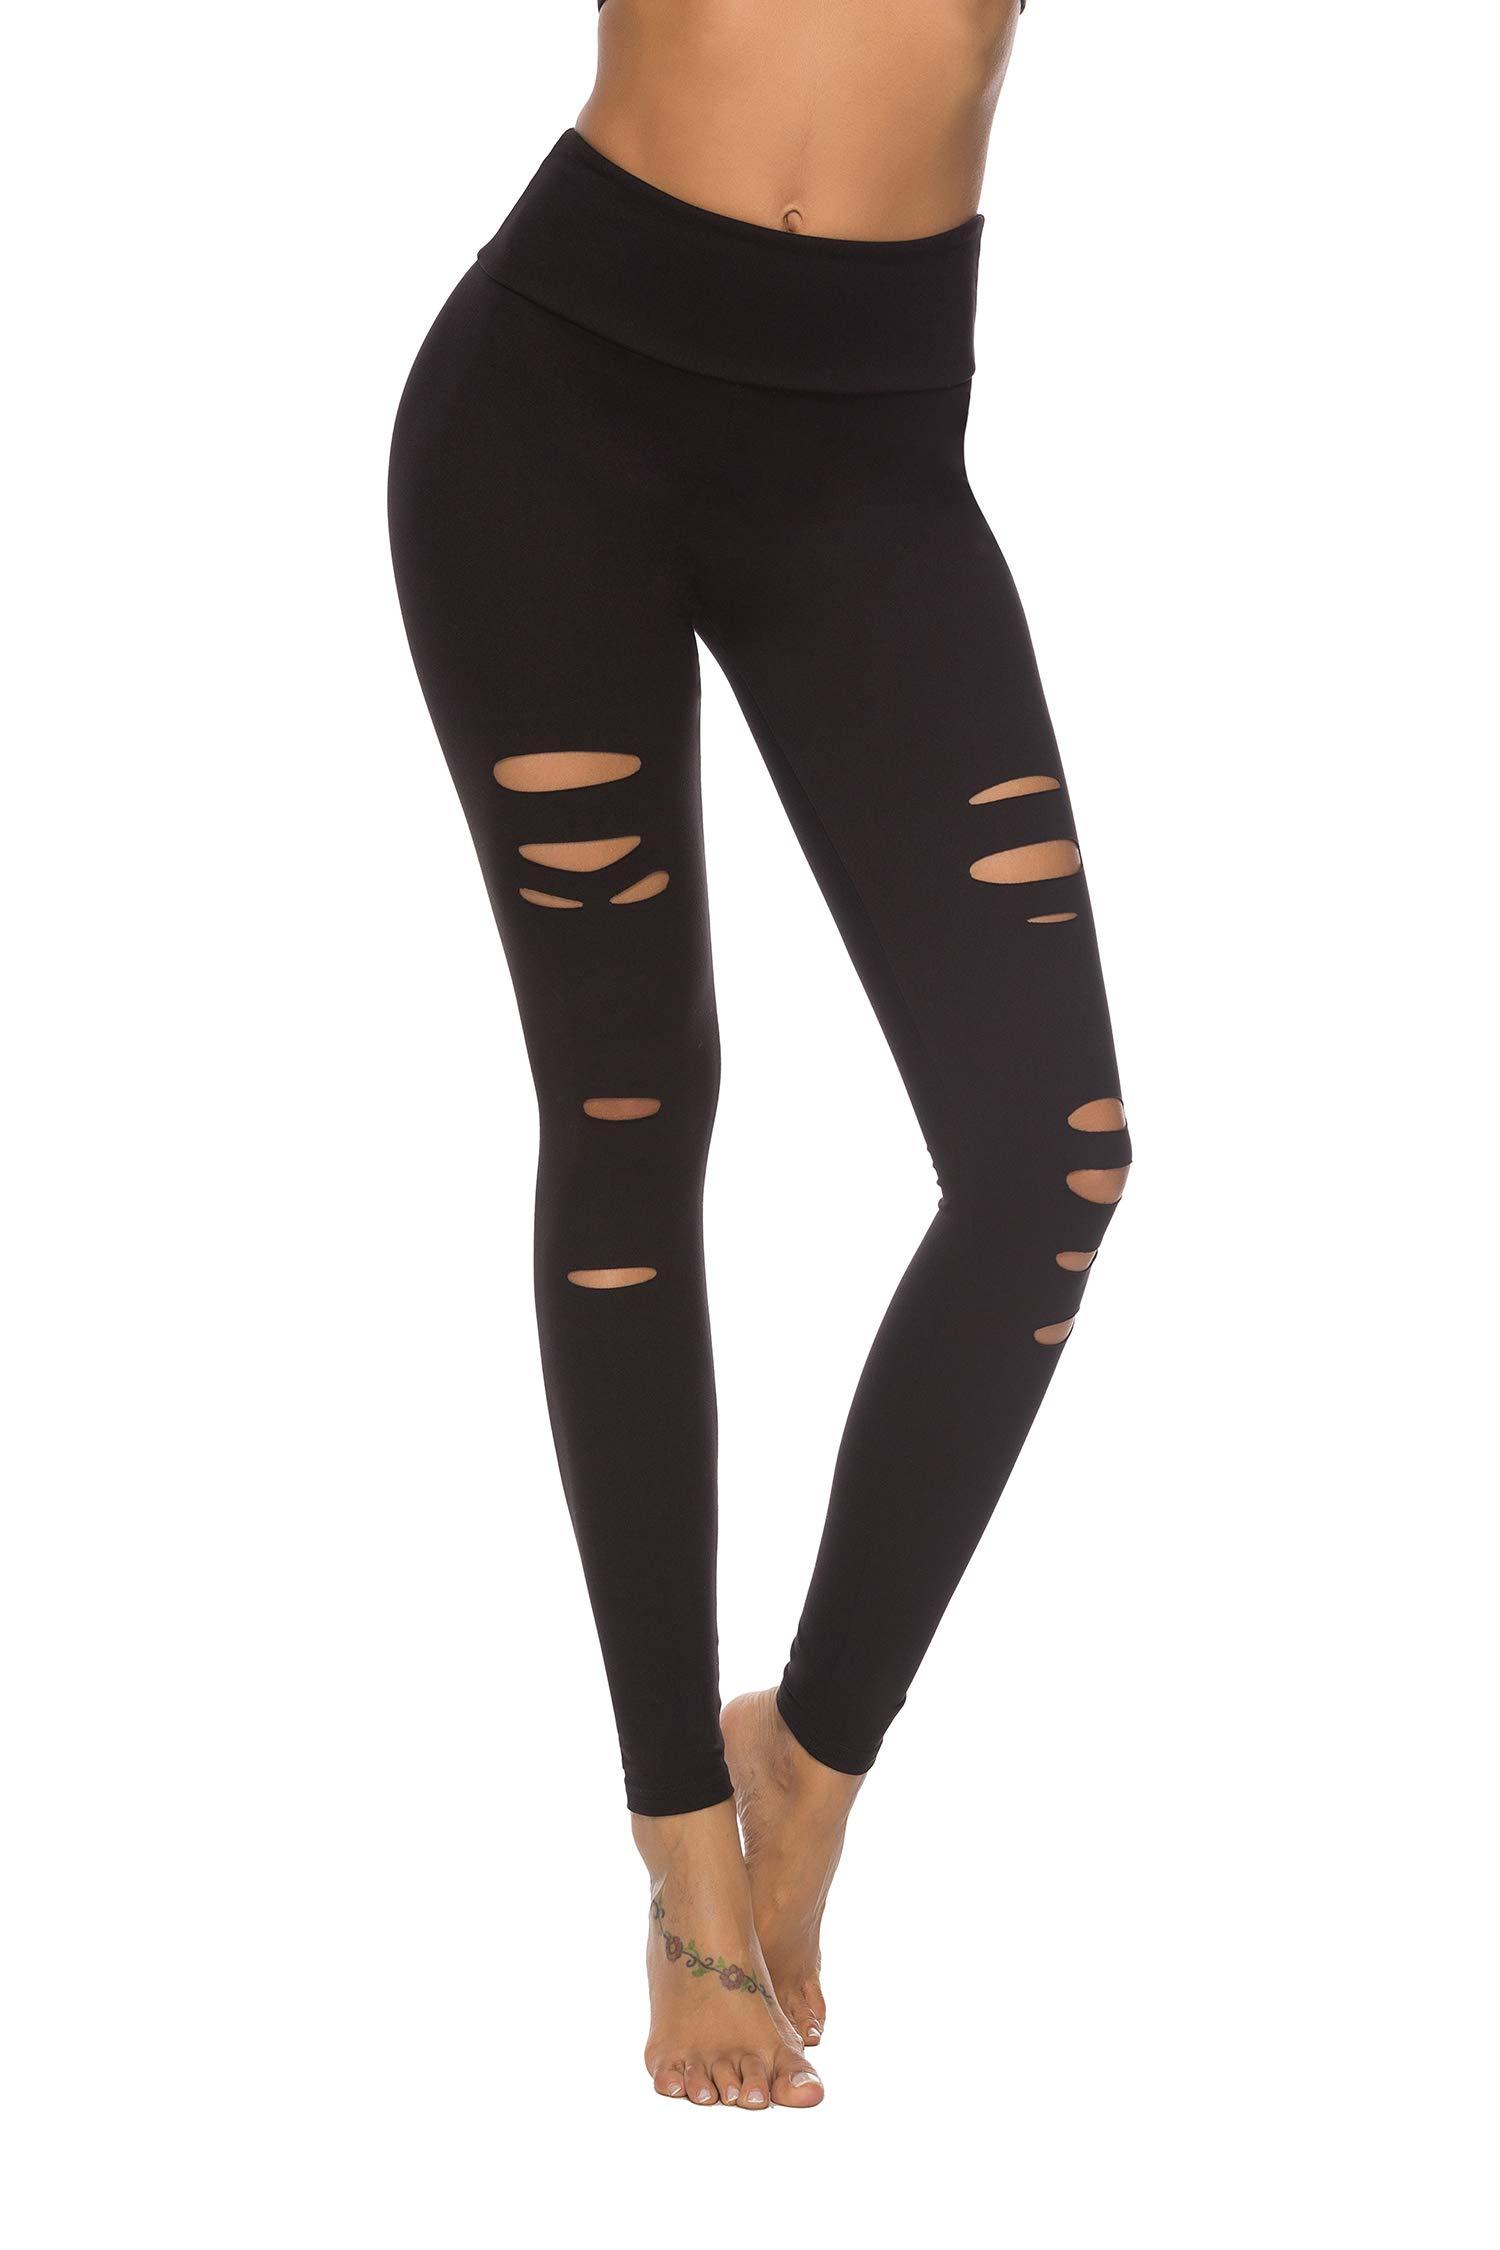 DIBAOLONG Womens High Waist Yoga Pants Cutout Ripped Tummy Control Workout Running Yoga Skinny LeggingsBlack L by DIBAOLONG